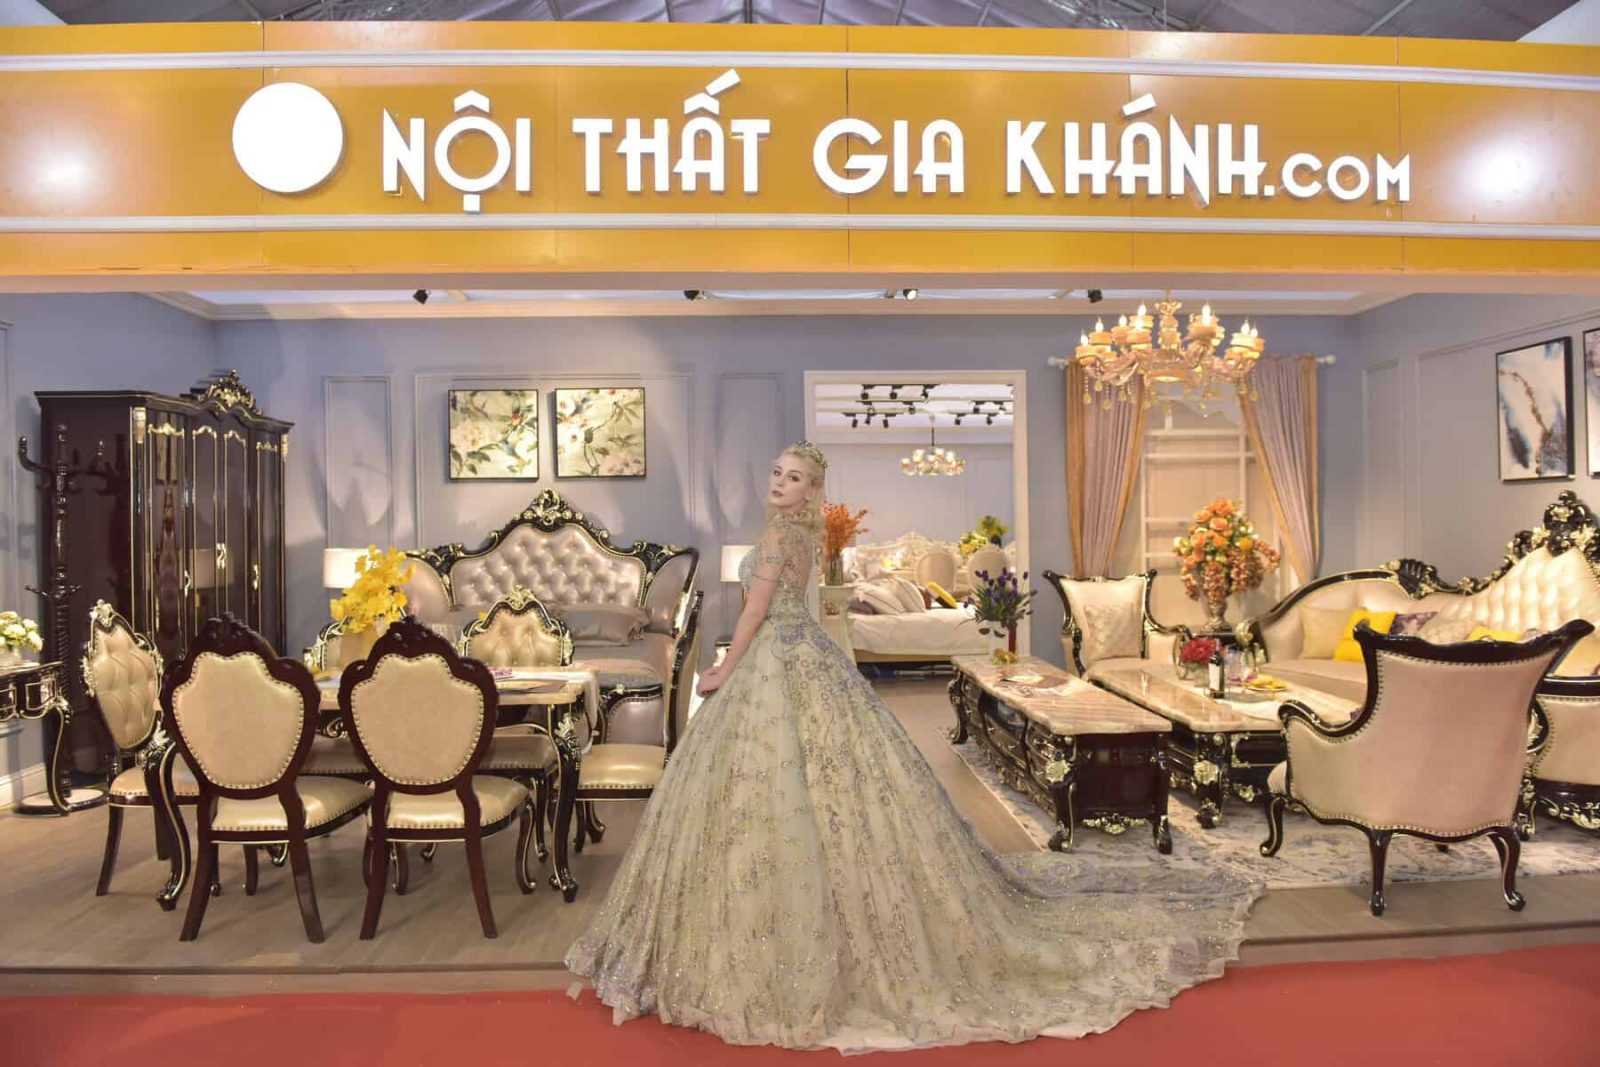 Ra Mat Bo Suu Tap The Wine – Nhung Kiet Tac Noi That Mau Ruou Nho 14